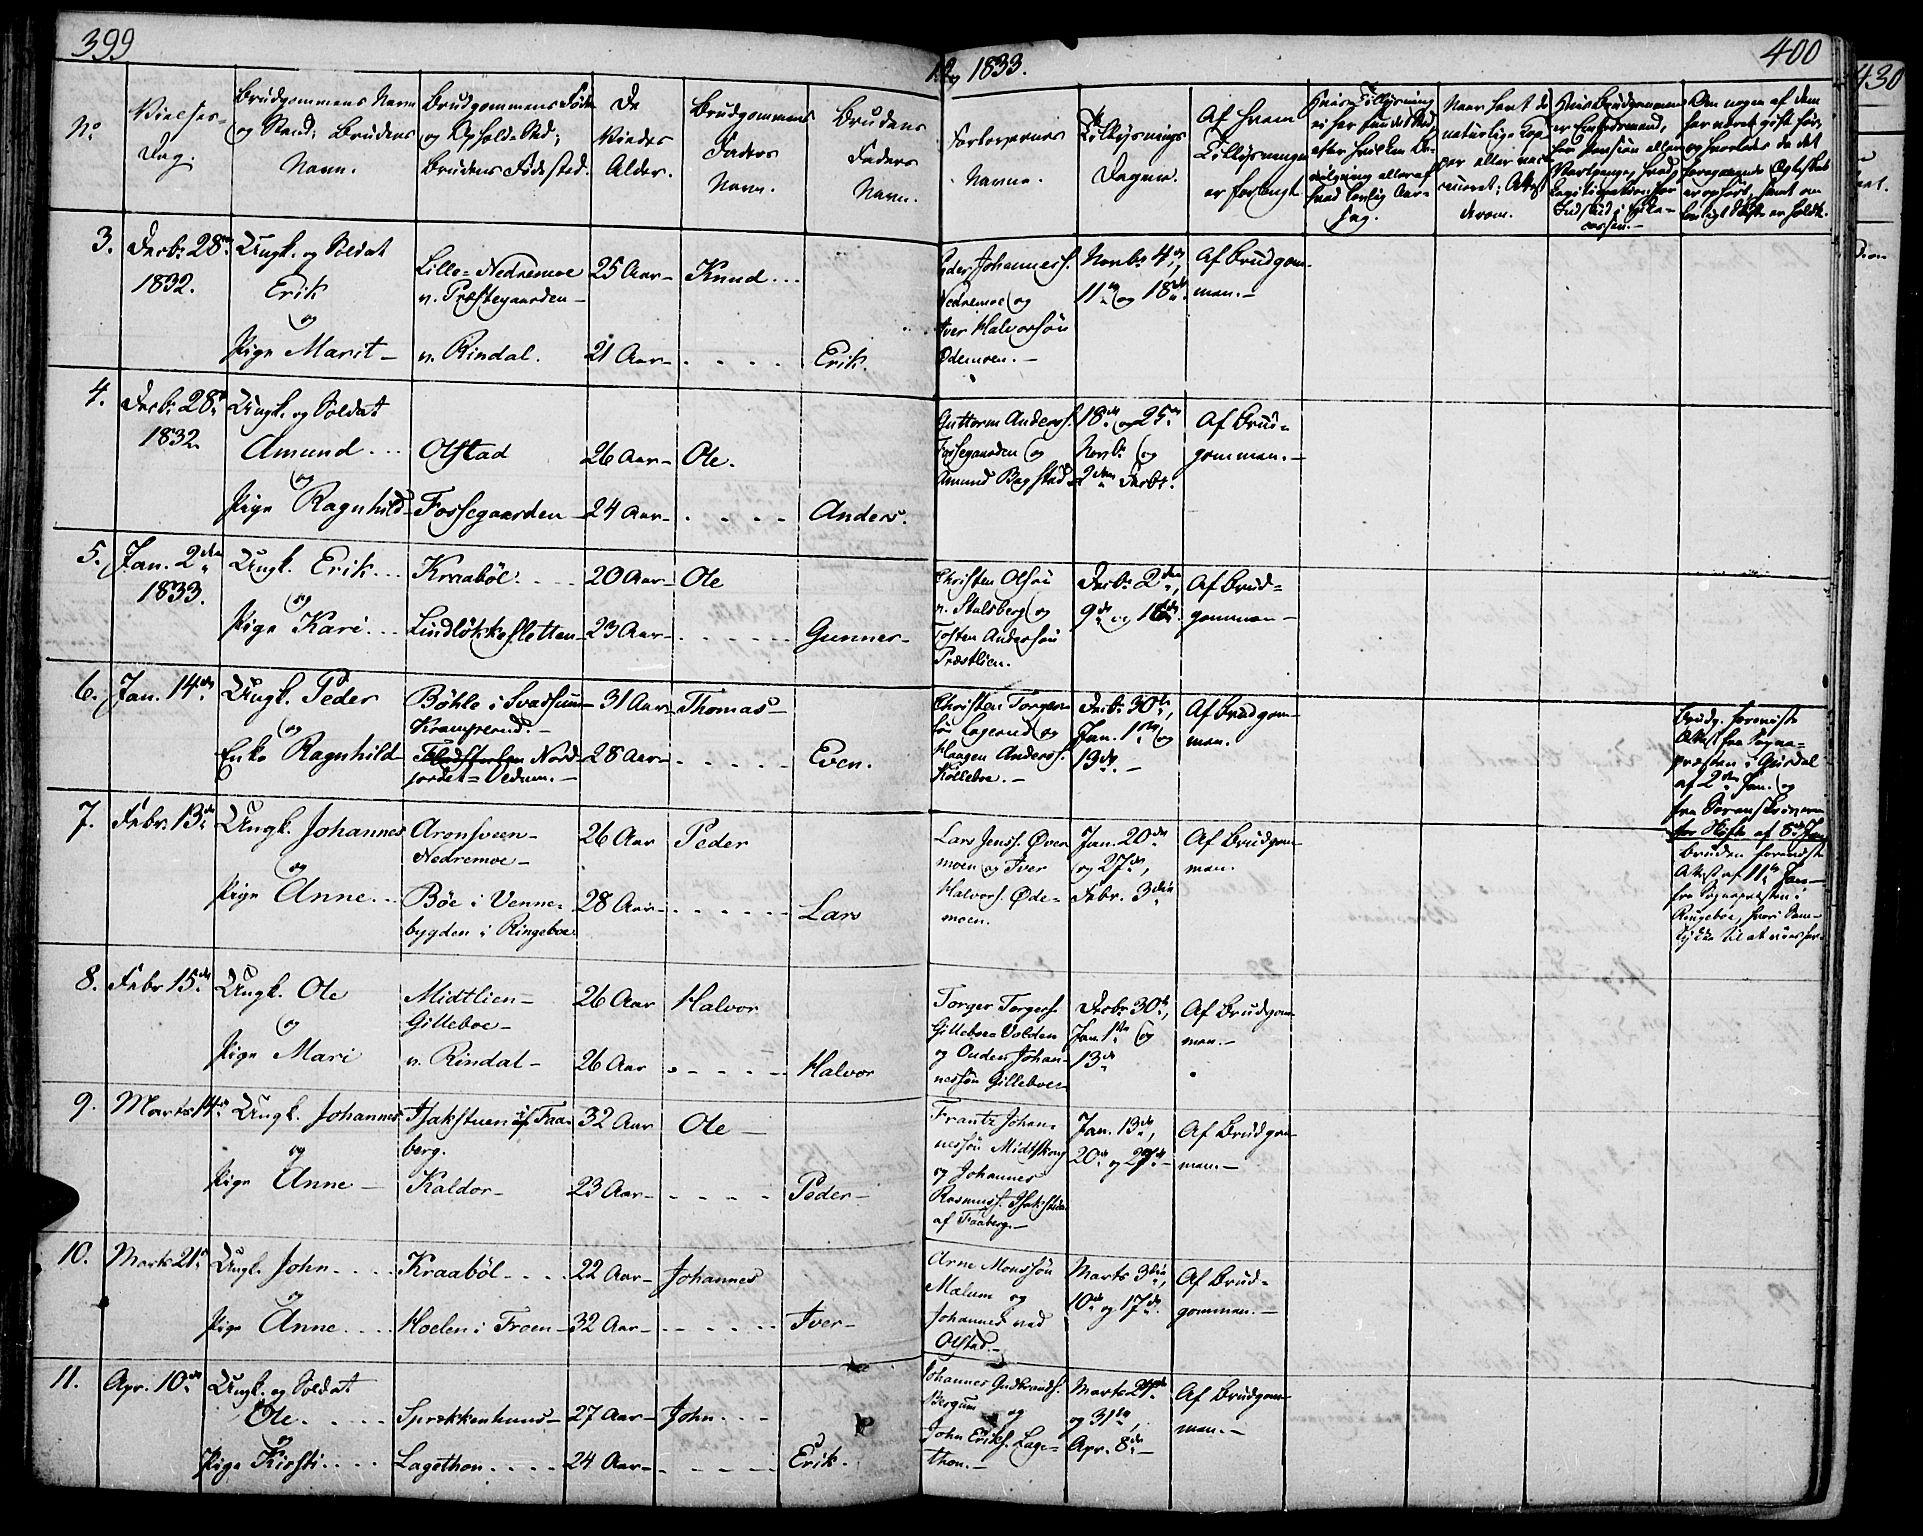 SAH, Øyer prestekontor, Ministerialbok nr. 4, 1824-1841, s. 399-400